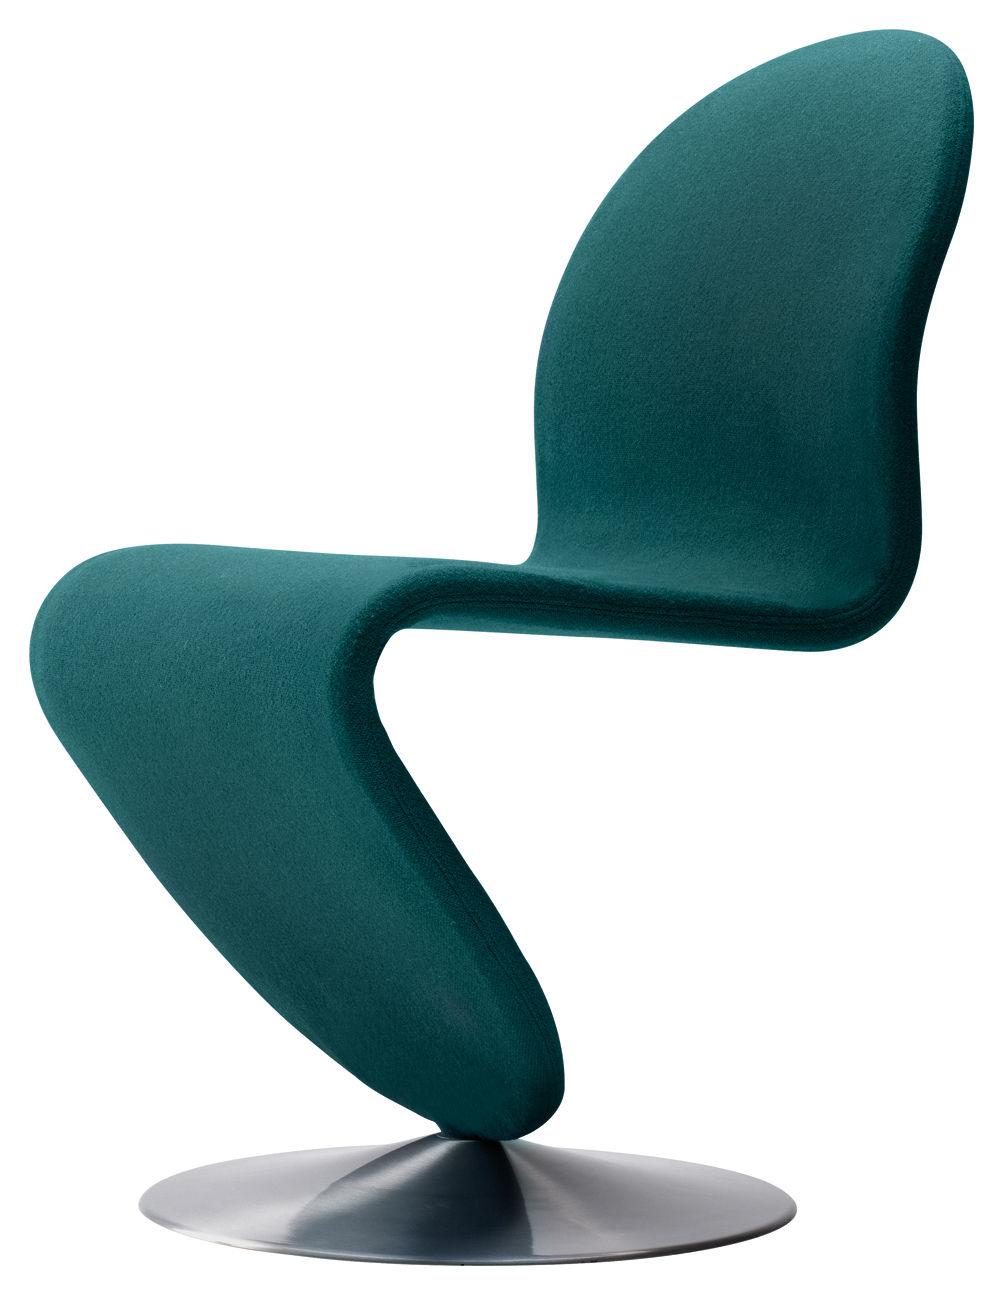 chaise rembourr e 123 tissu exclu web bleu p trole verpan. Black Bedroom Furniture Sets. Home Design Ideas